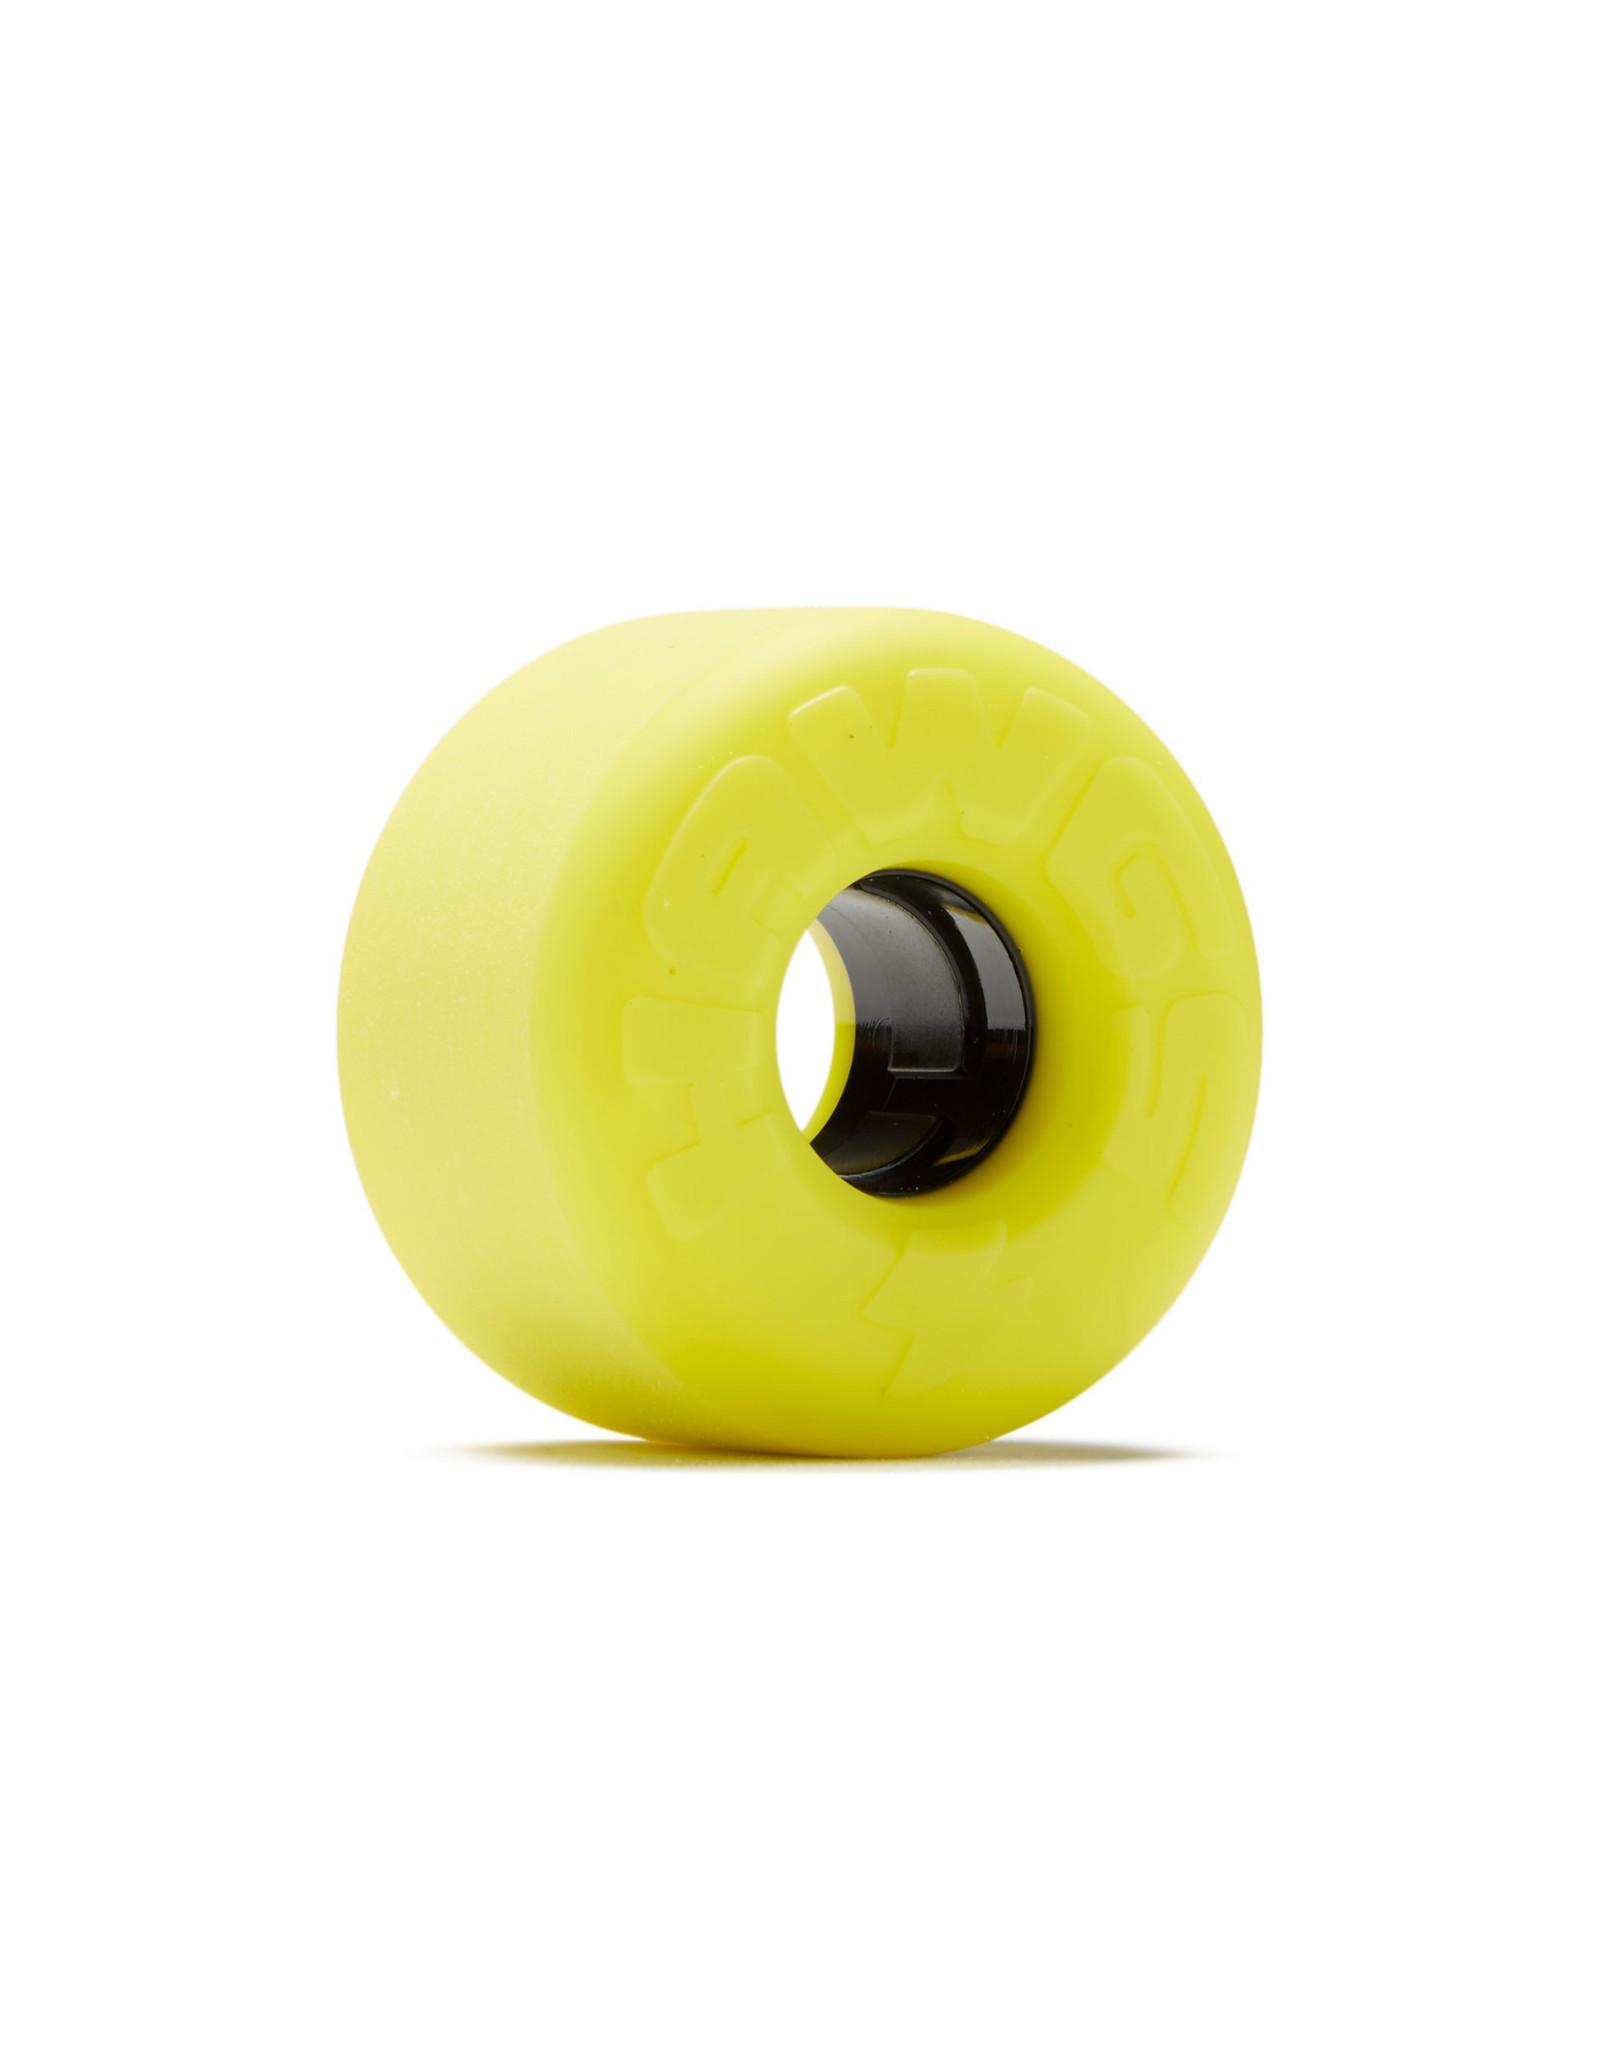 Hawgs Wheels Hawgs Lil' EZ Wheels 60 mm 78A Flat Banana Set of 4